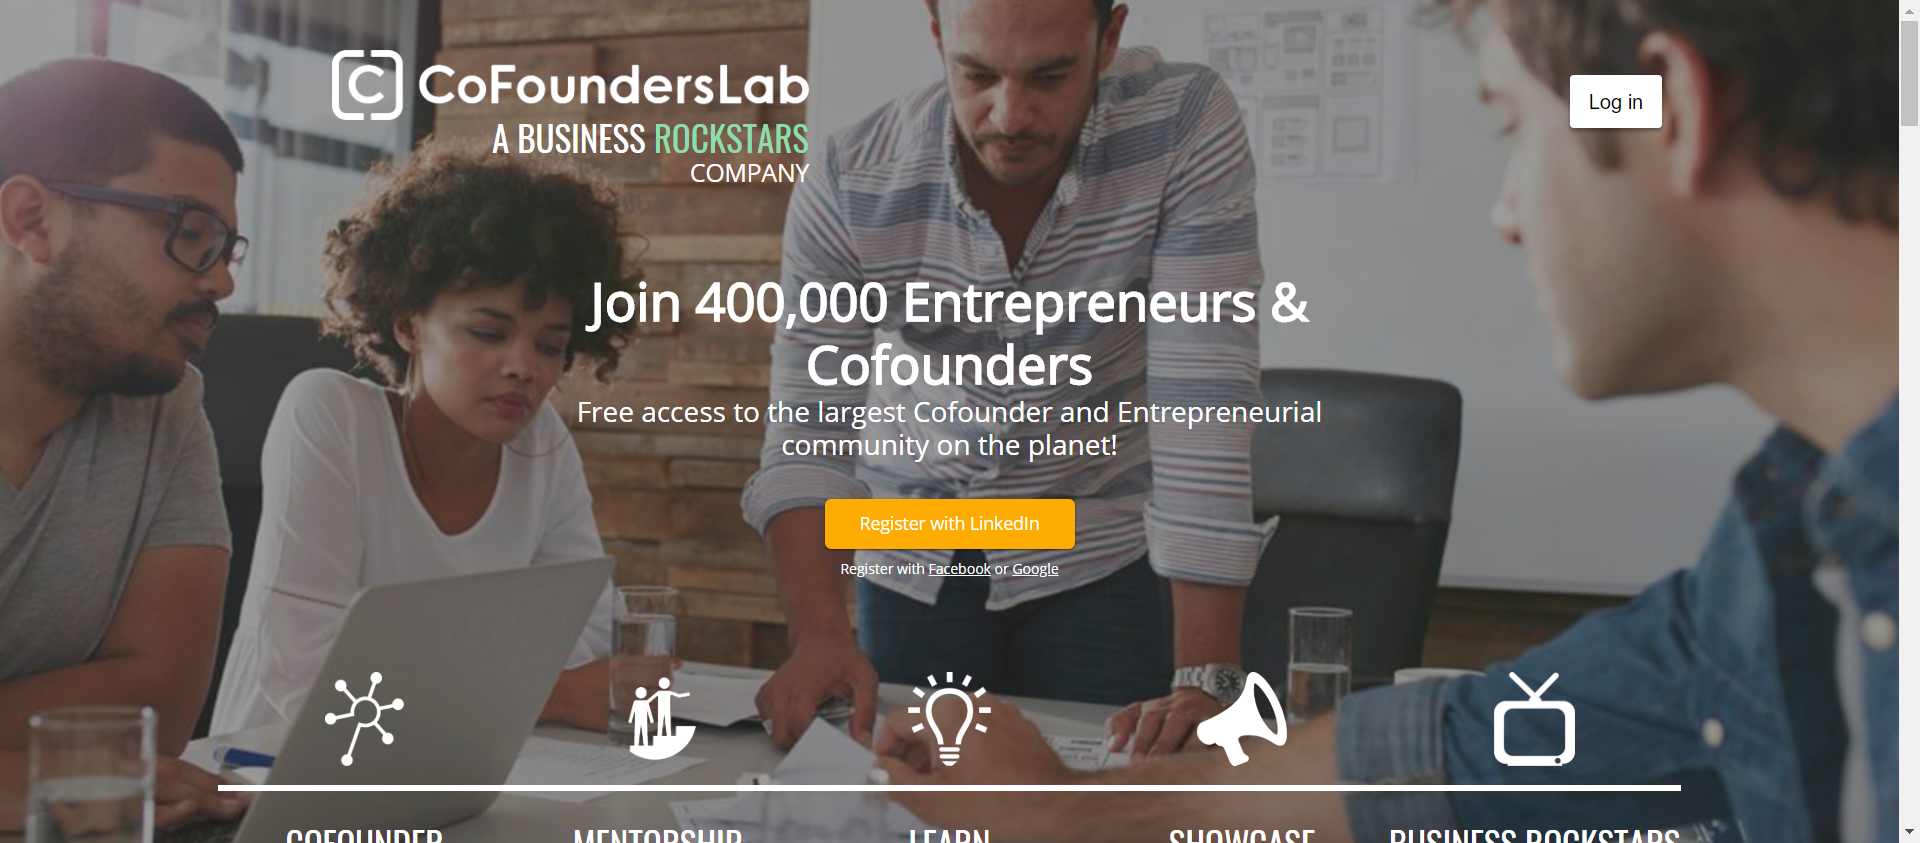 CoFoundersLab website image